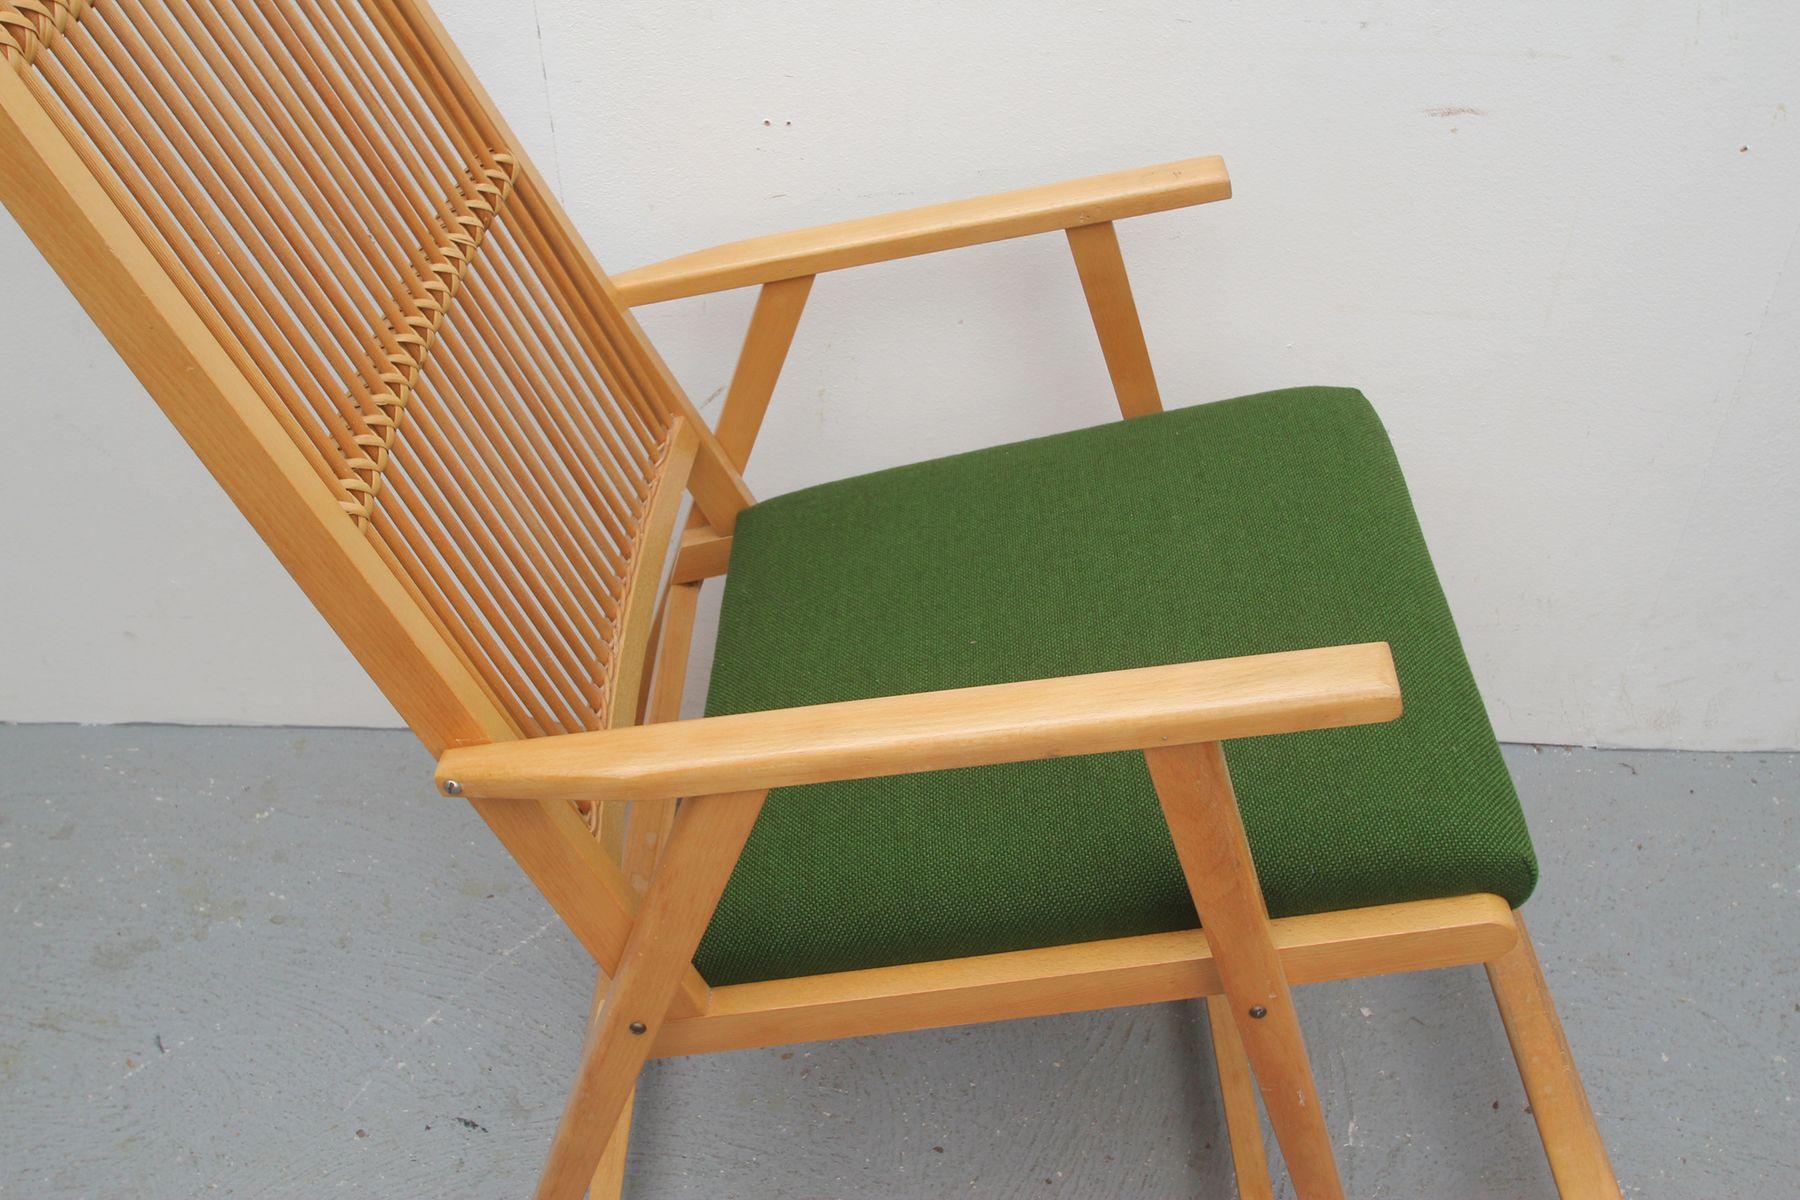 Deutscher bambus schaukelstuhl 1950er bei pamono kaufen for Schaukelstuhl bambus